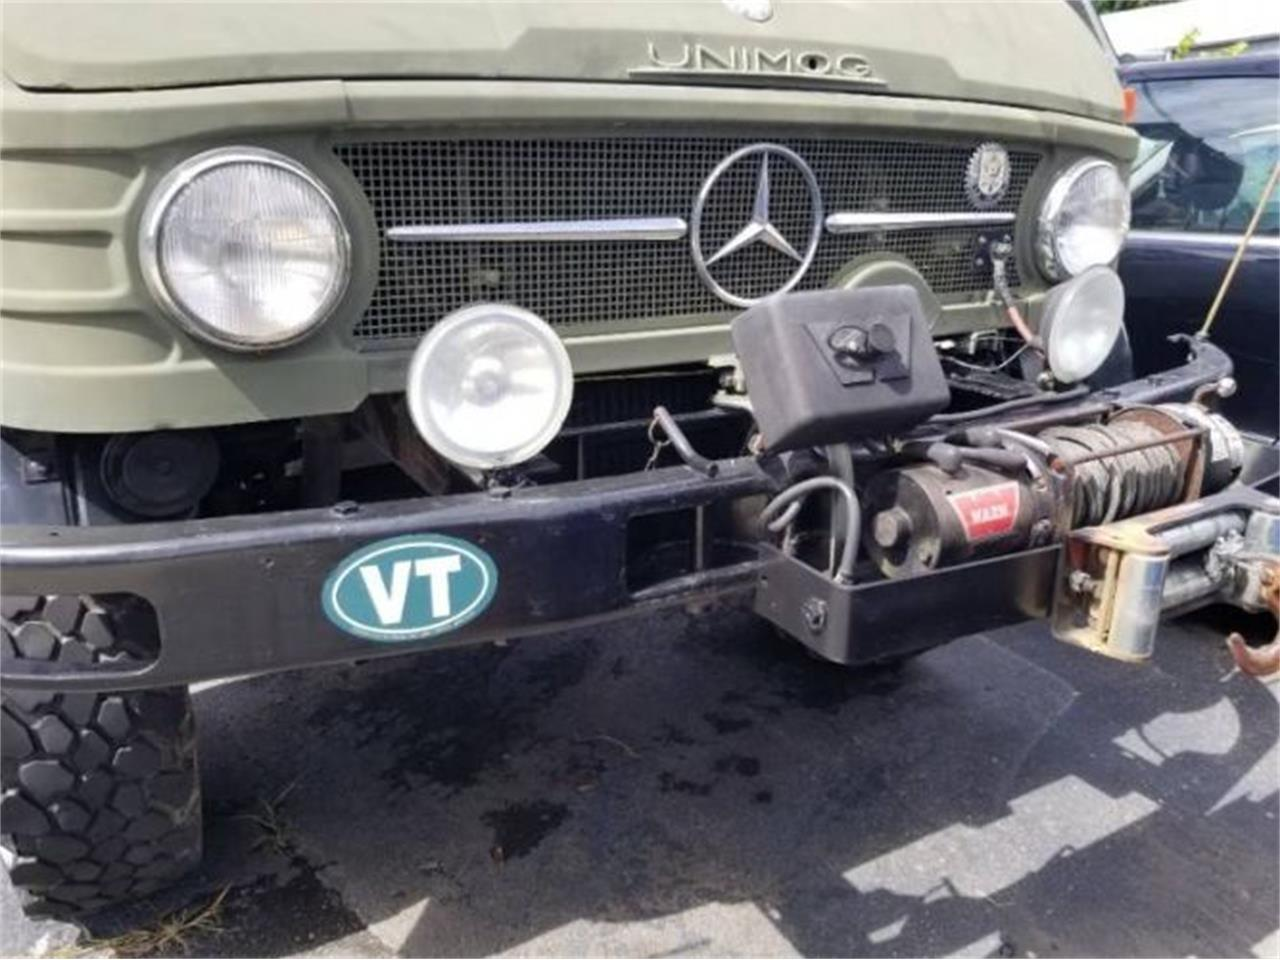 1972 Mercedes-Benz Unimog for sale in Cadillac, MI ...